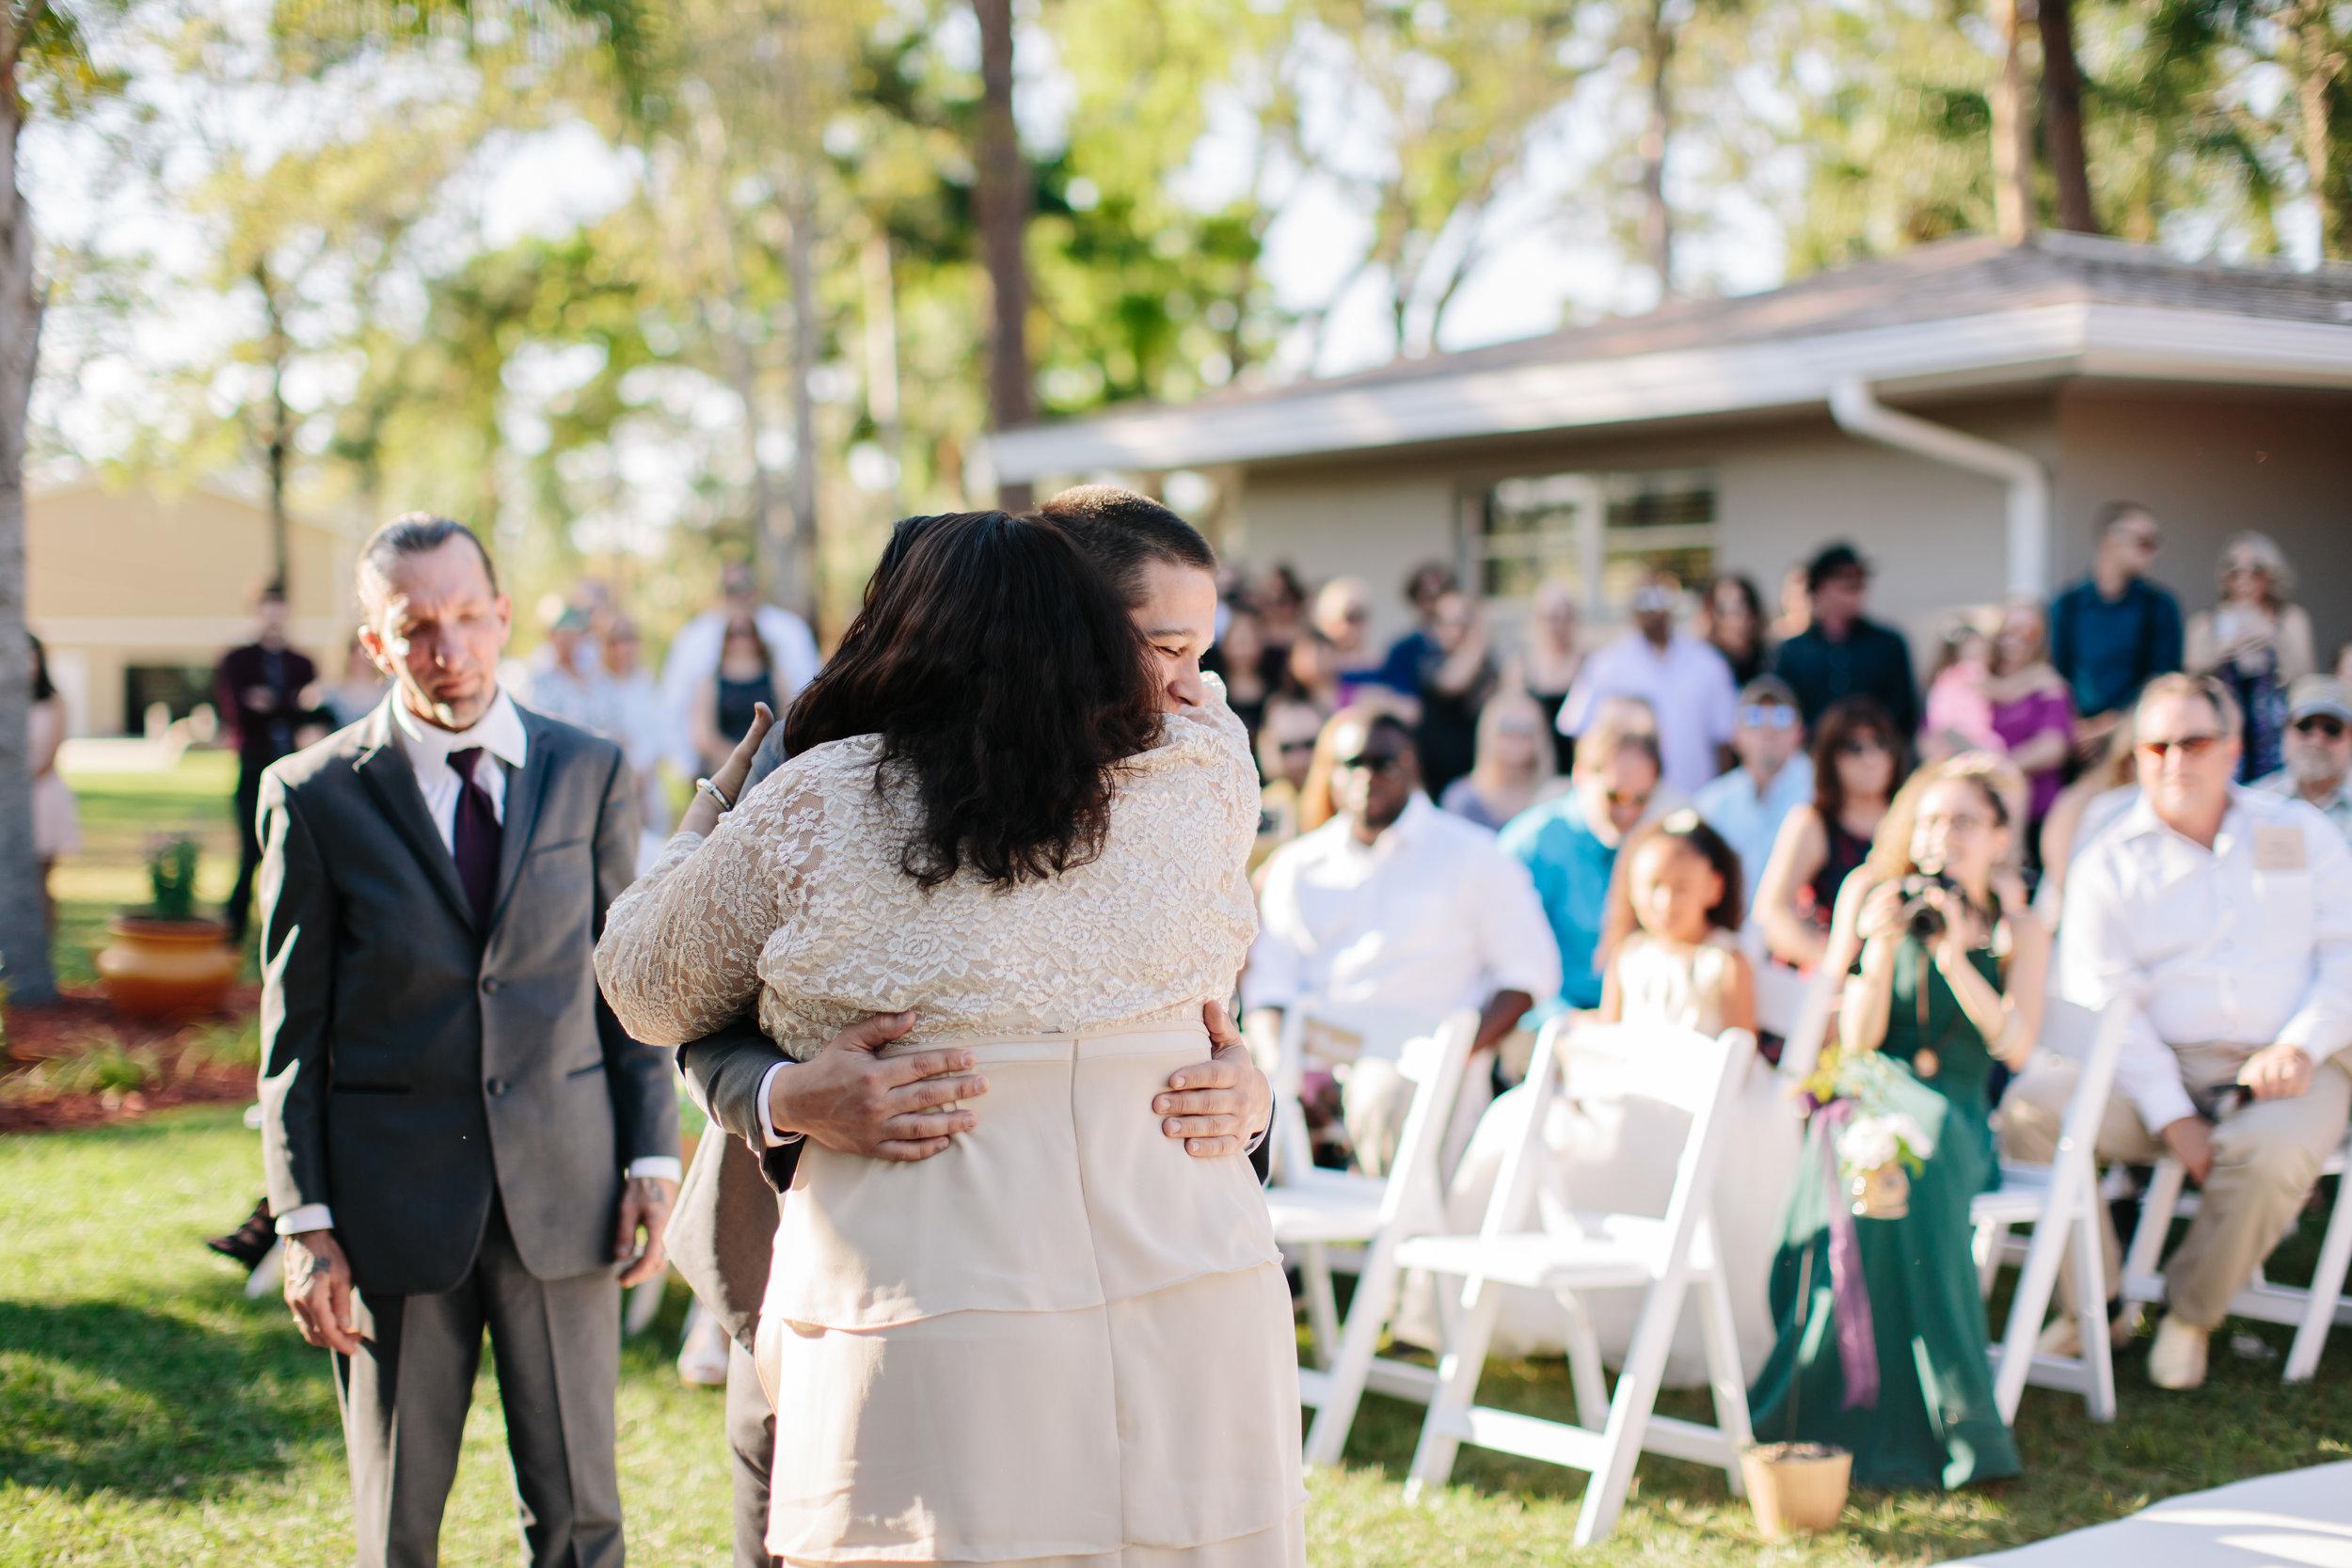 2018.02.17 Whitney and Joe Meyer Melbourne Wedding (214 of 759).jpg